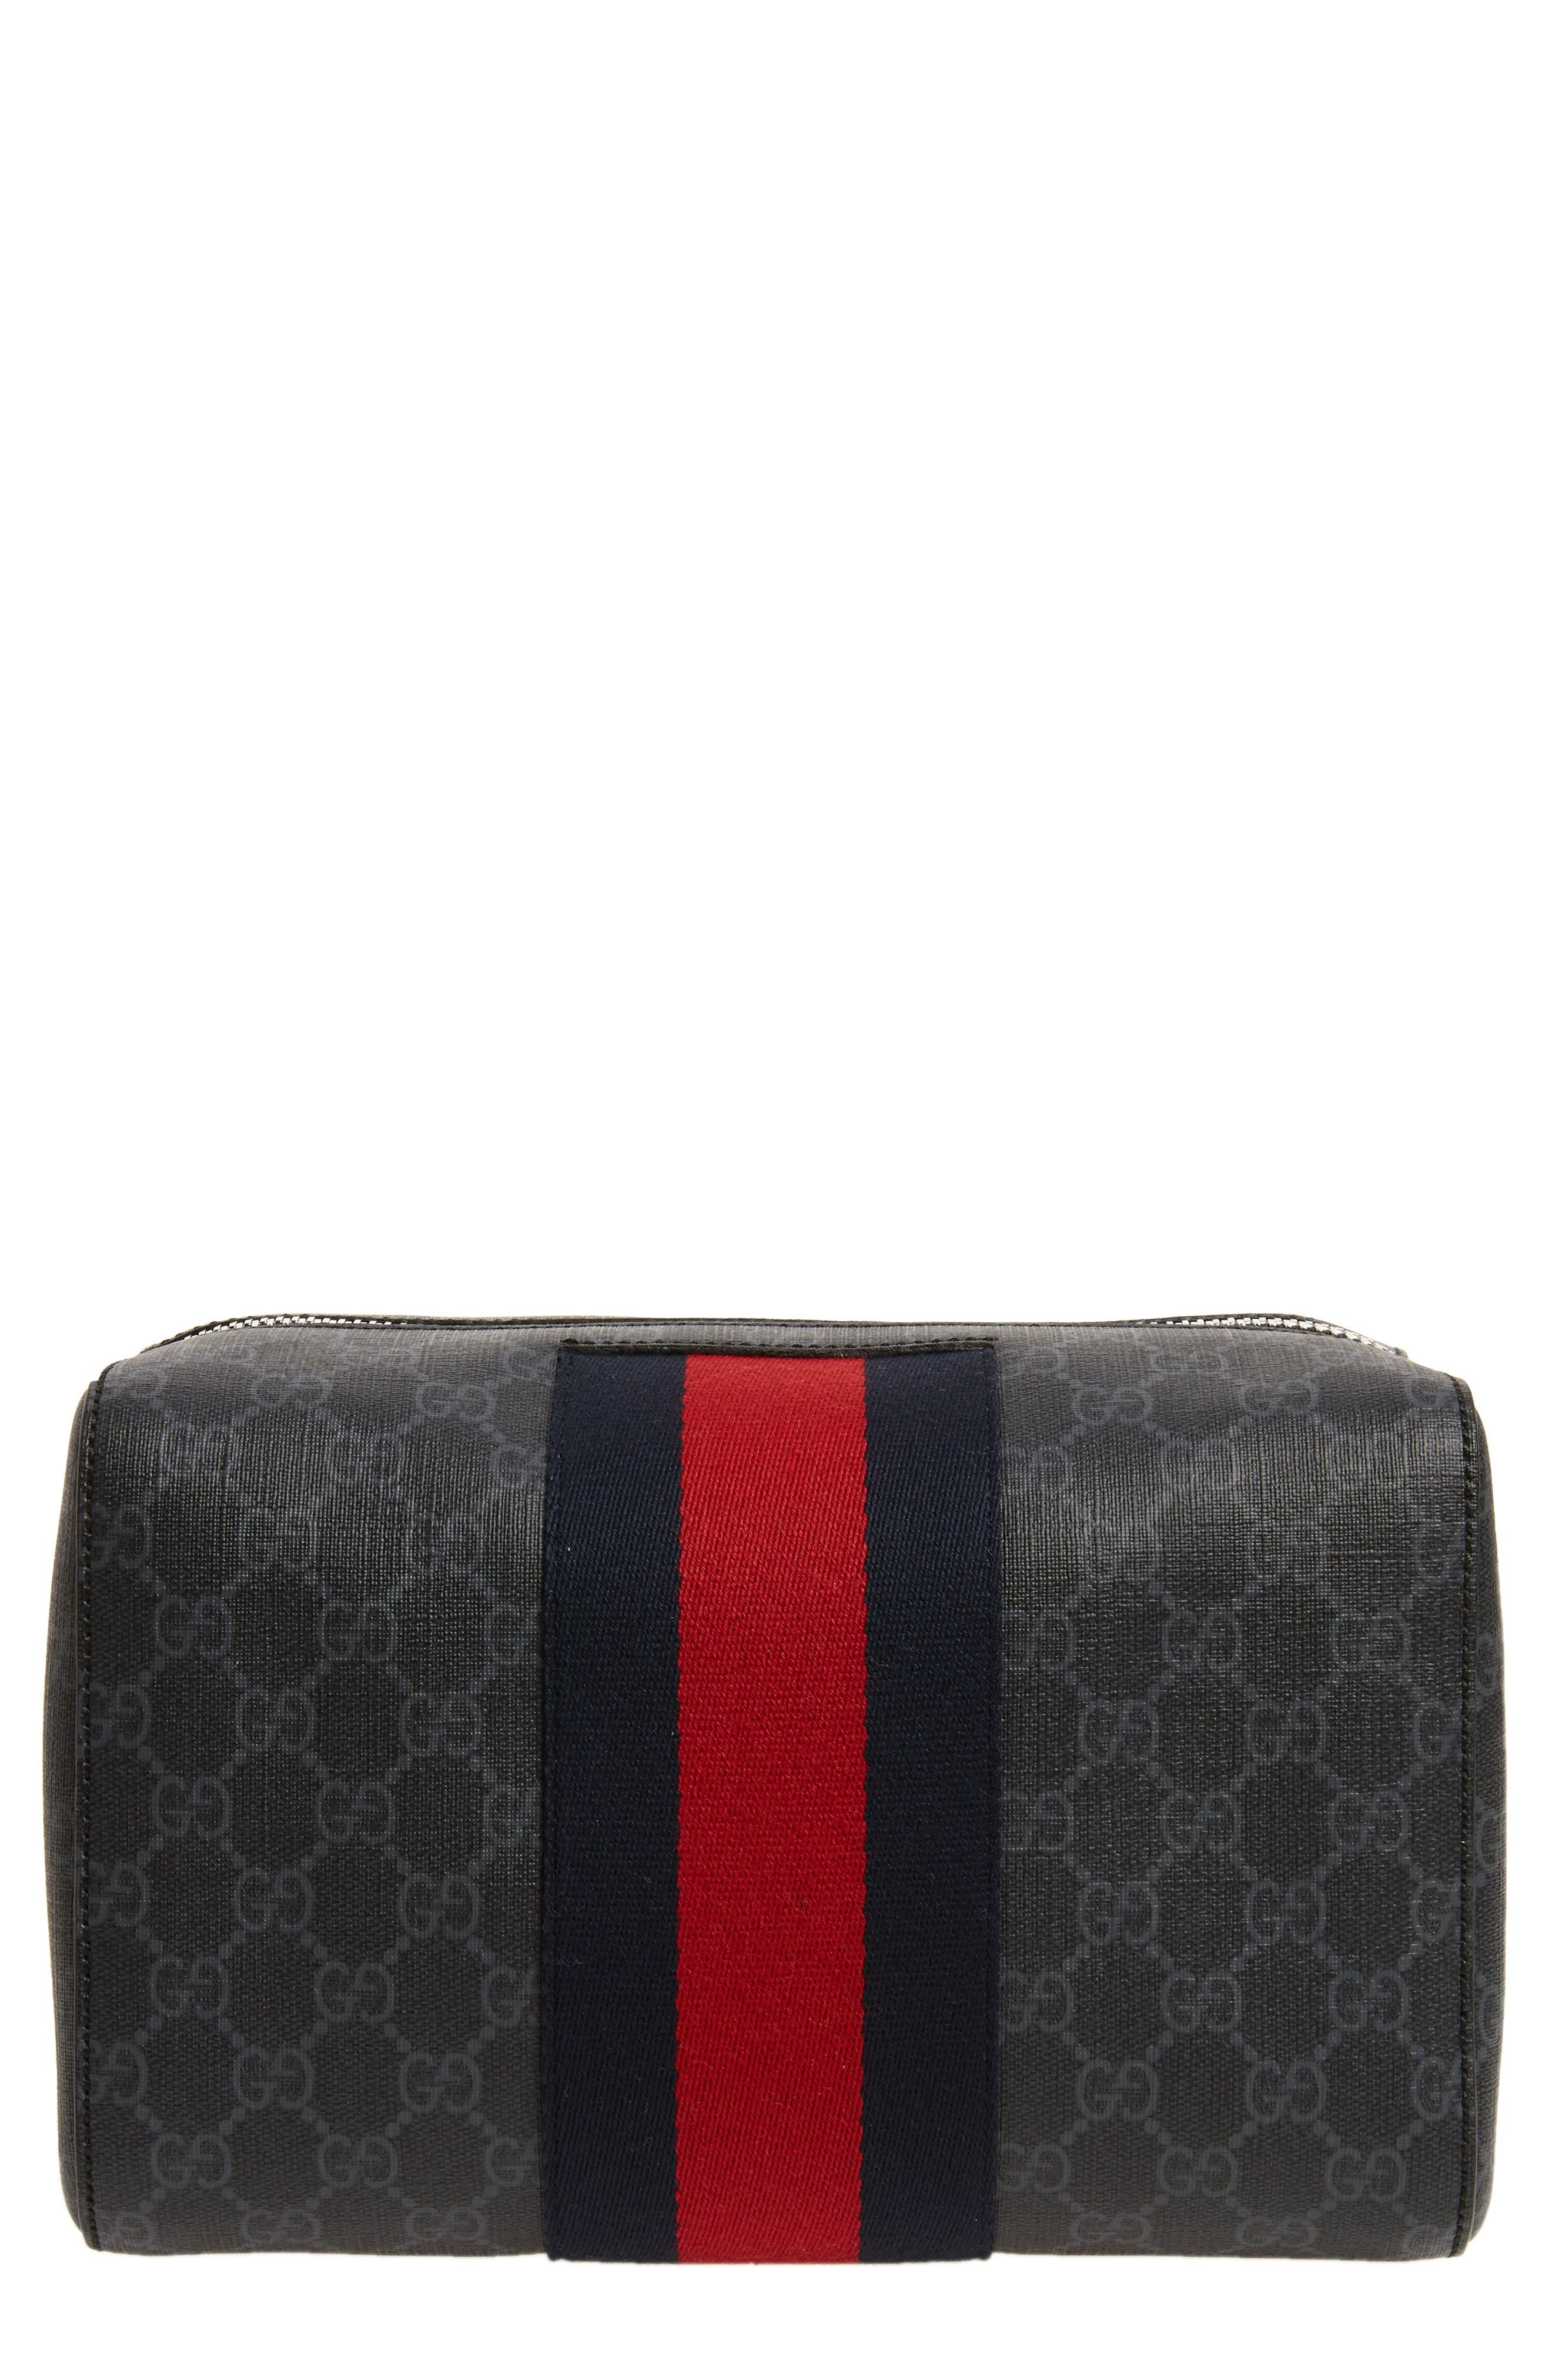 GG Supreme Hand Duffel Bag,                             Main thumbnail 1, color,                             001